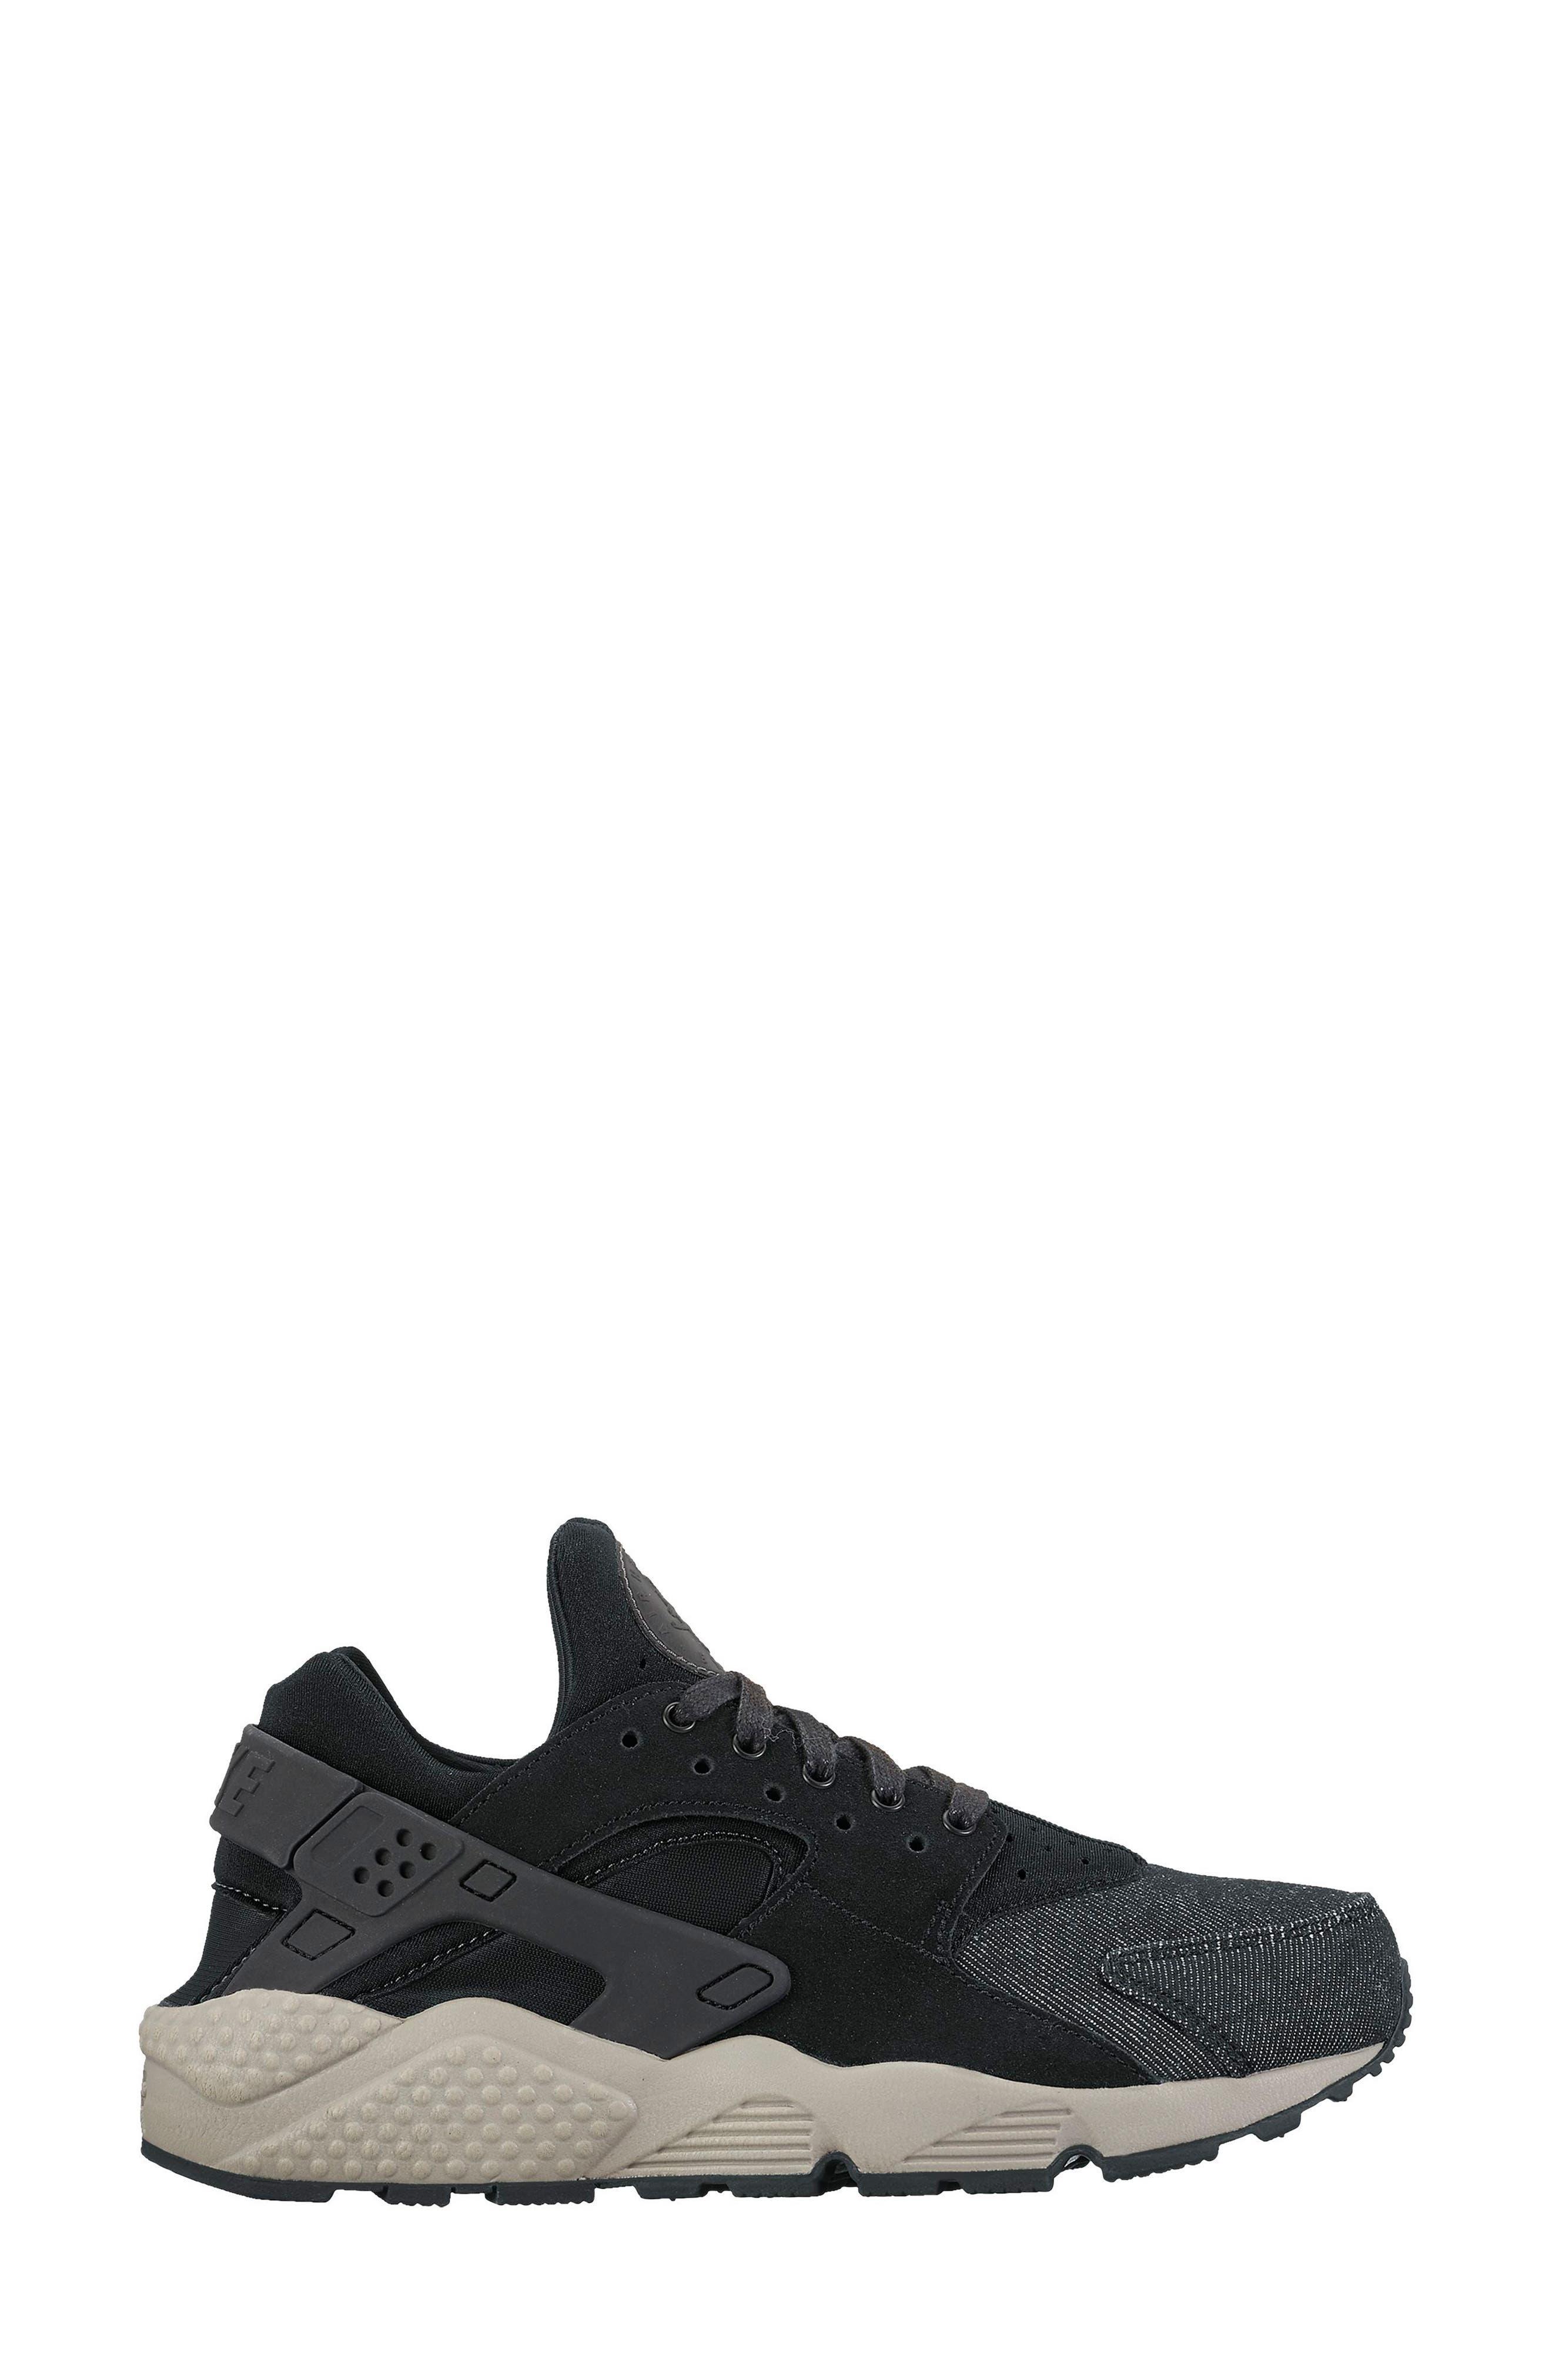 Air Huarache Run SE Sneaker,                         Main,                         color, Black/ Dark Grey/ Cobblestone